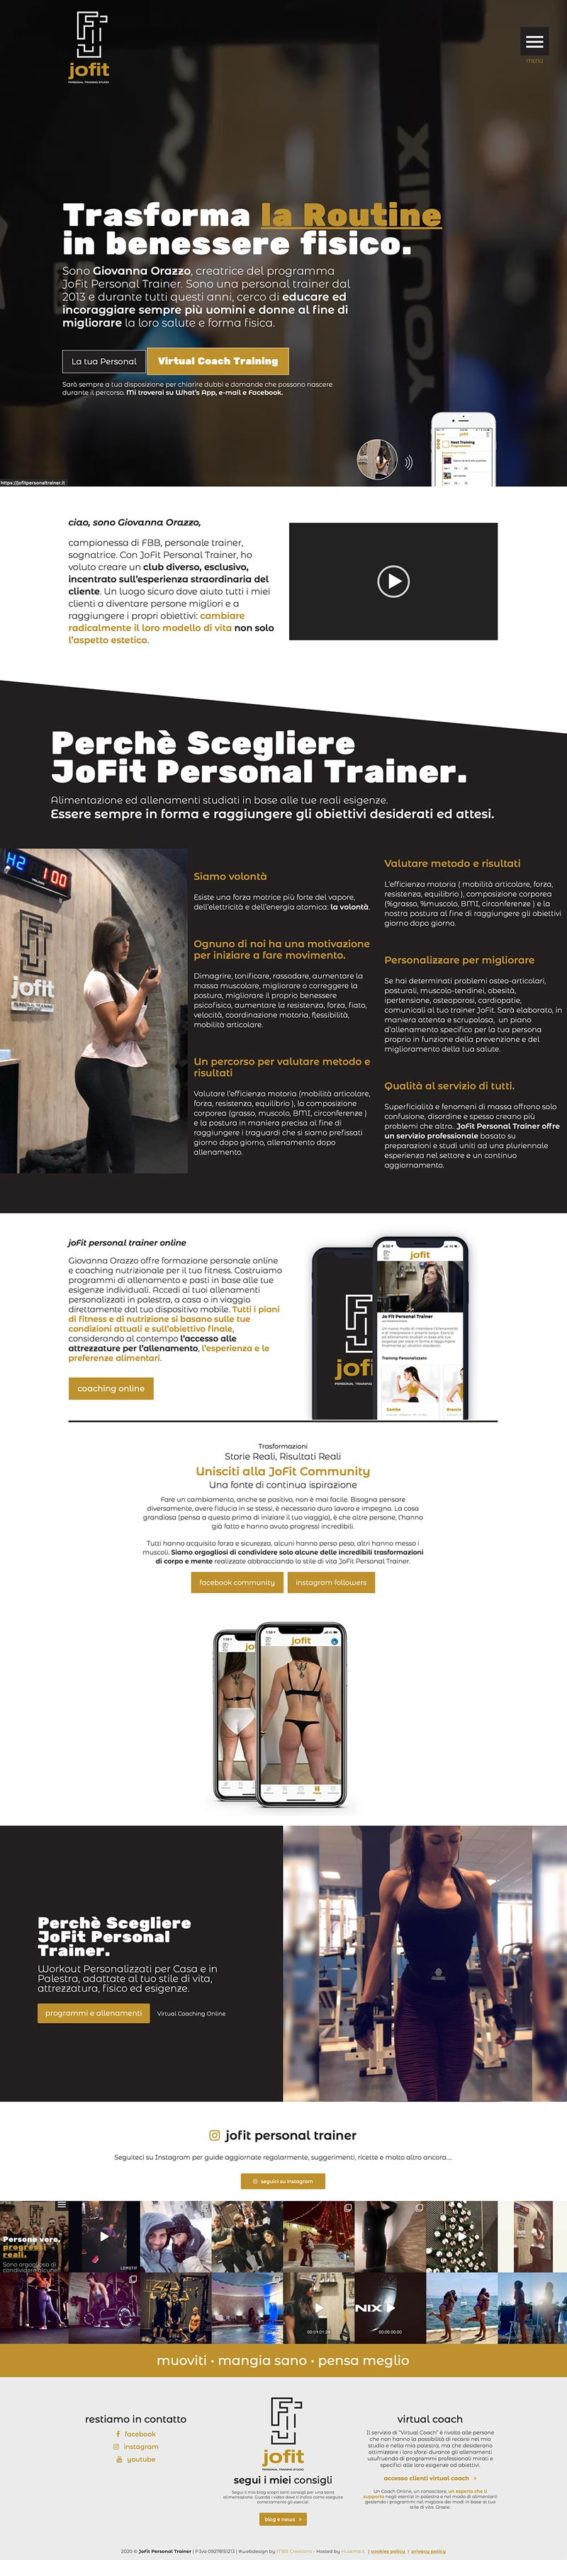 JoFit Personal Trainer Webdesign